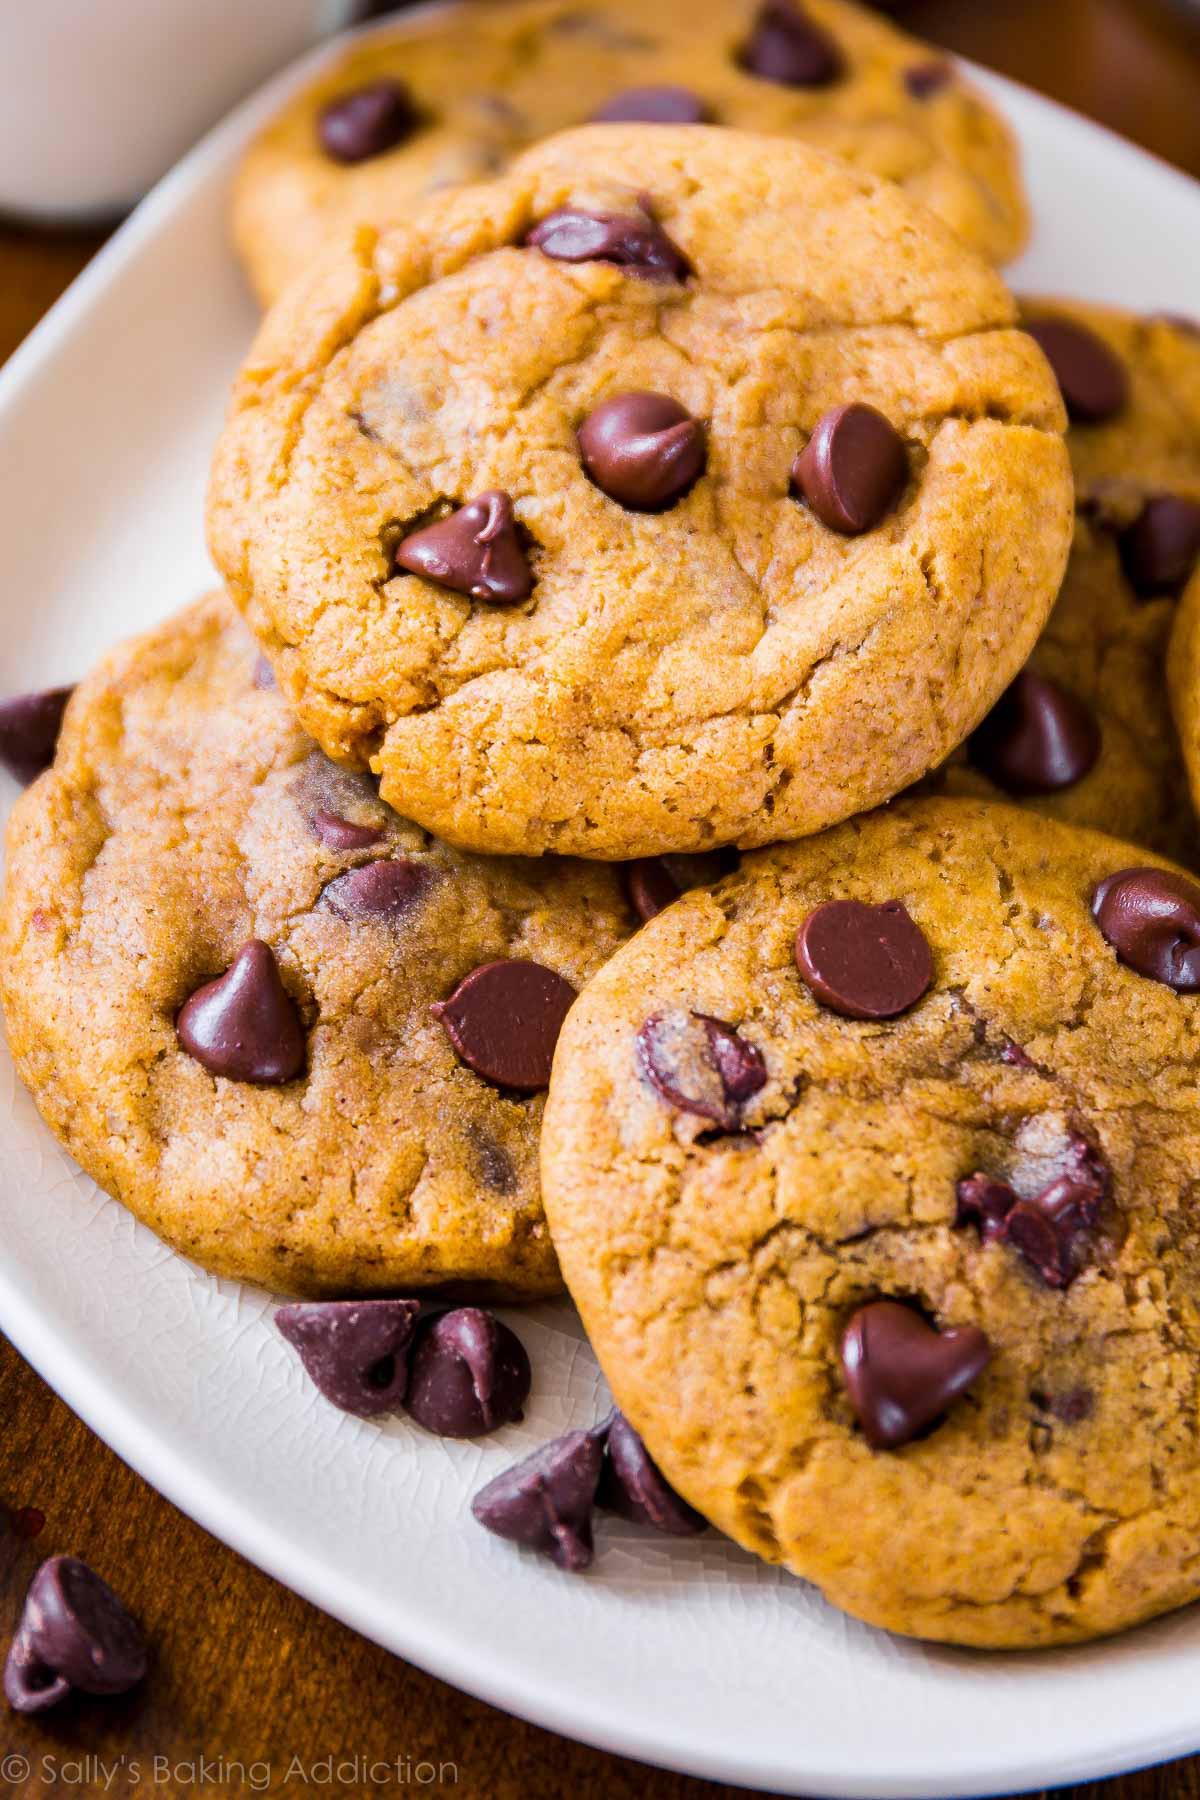 Chocolate Chip Cookies Allrecipes  Pumpkin Chocolate Chip Cookies Sallys Baking Addiction